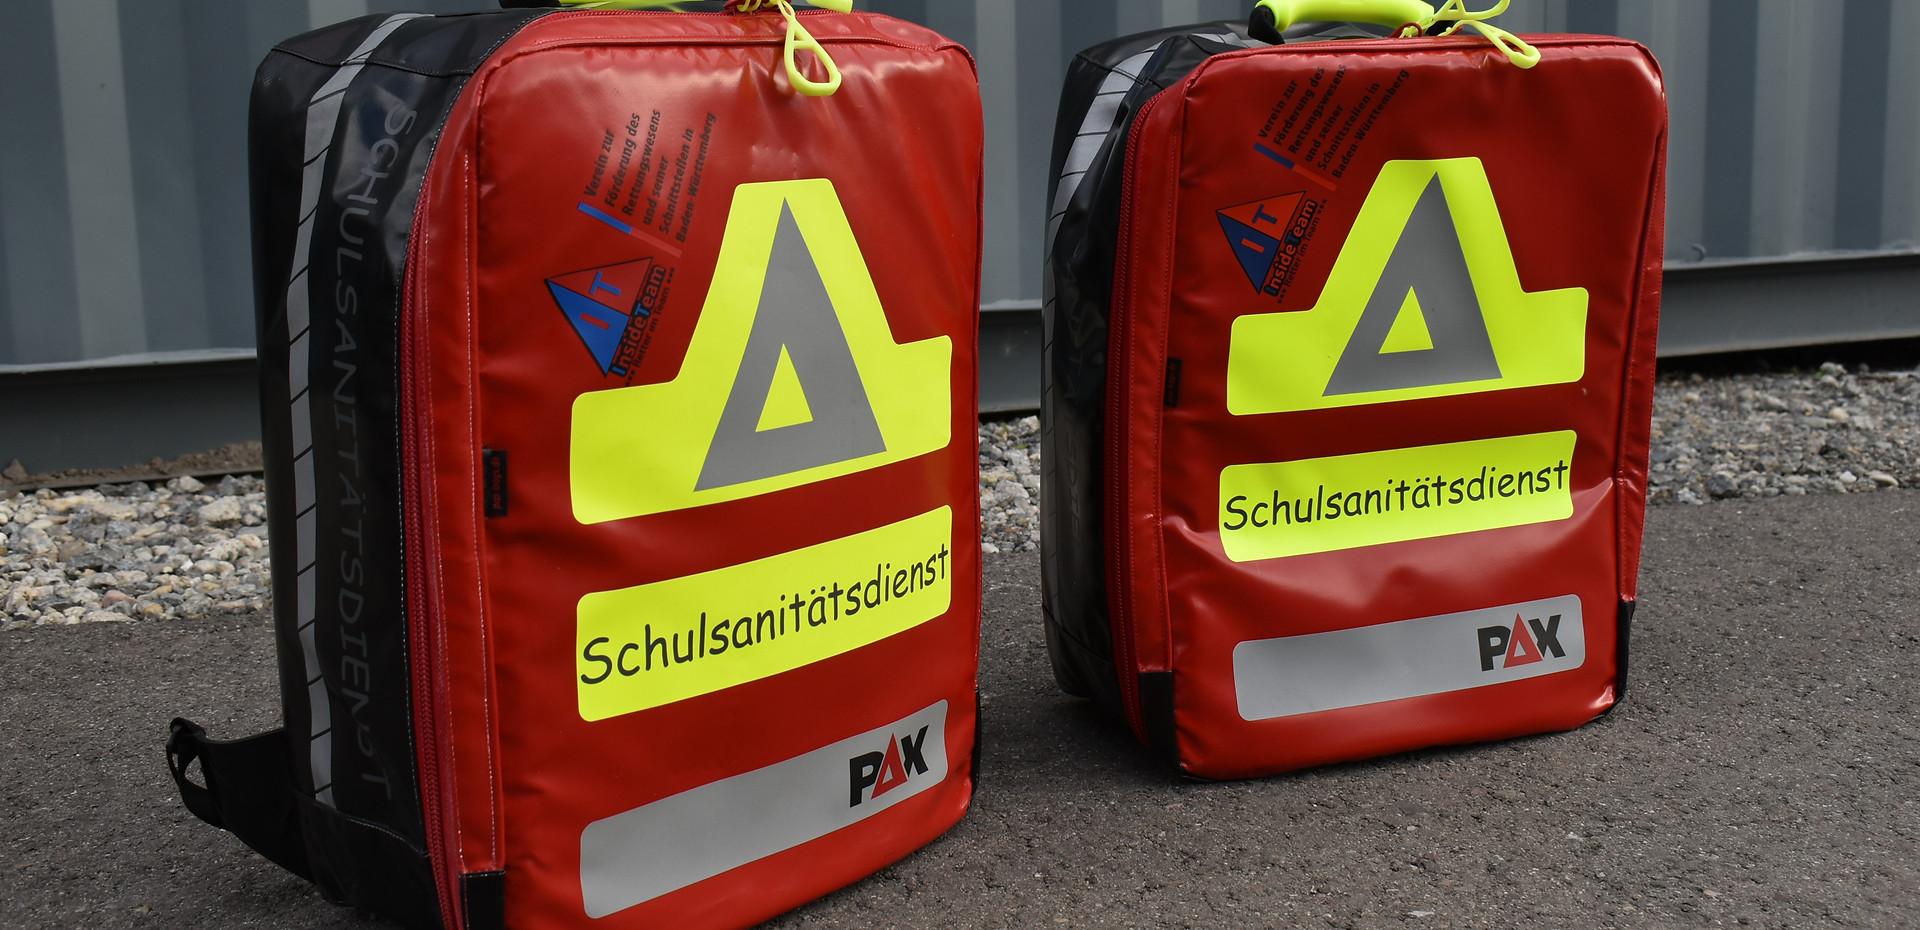 Schulsanitätsdienst-Rucksäcke